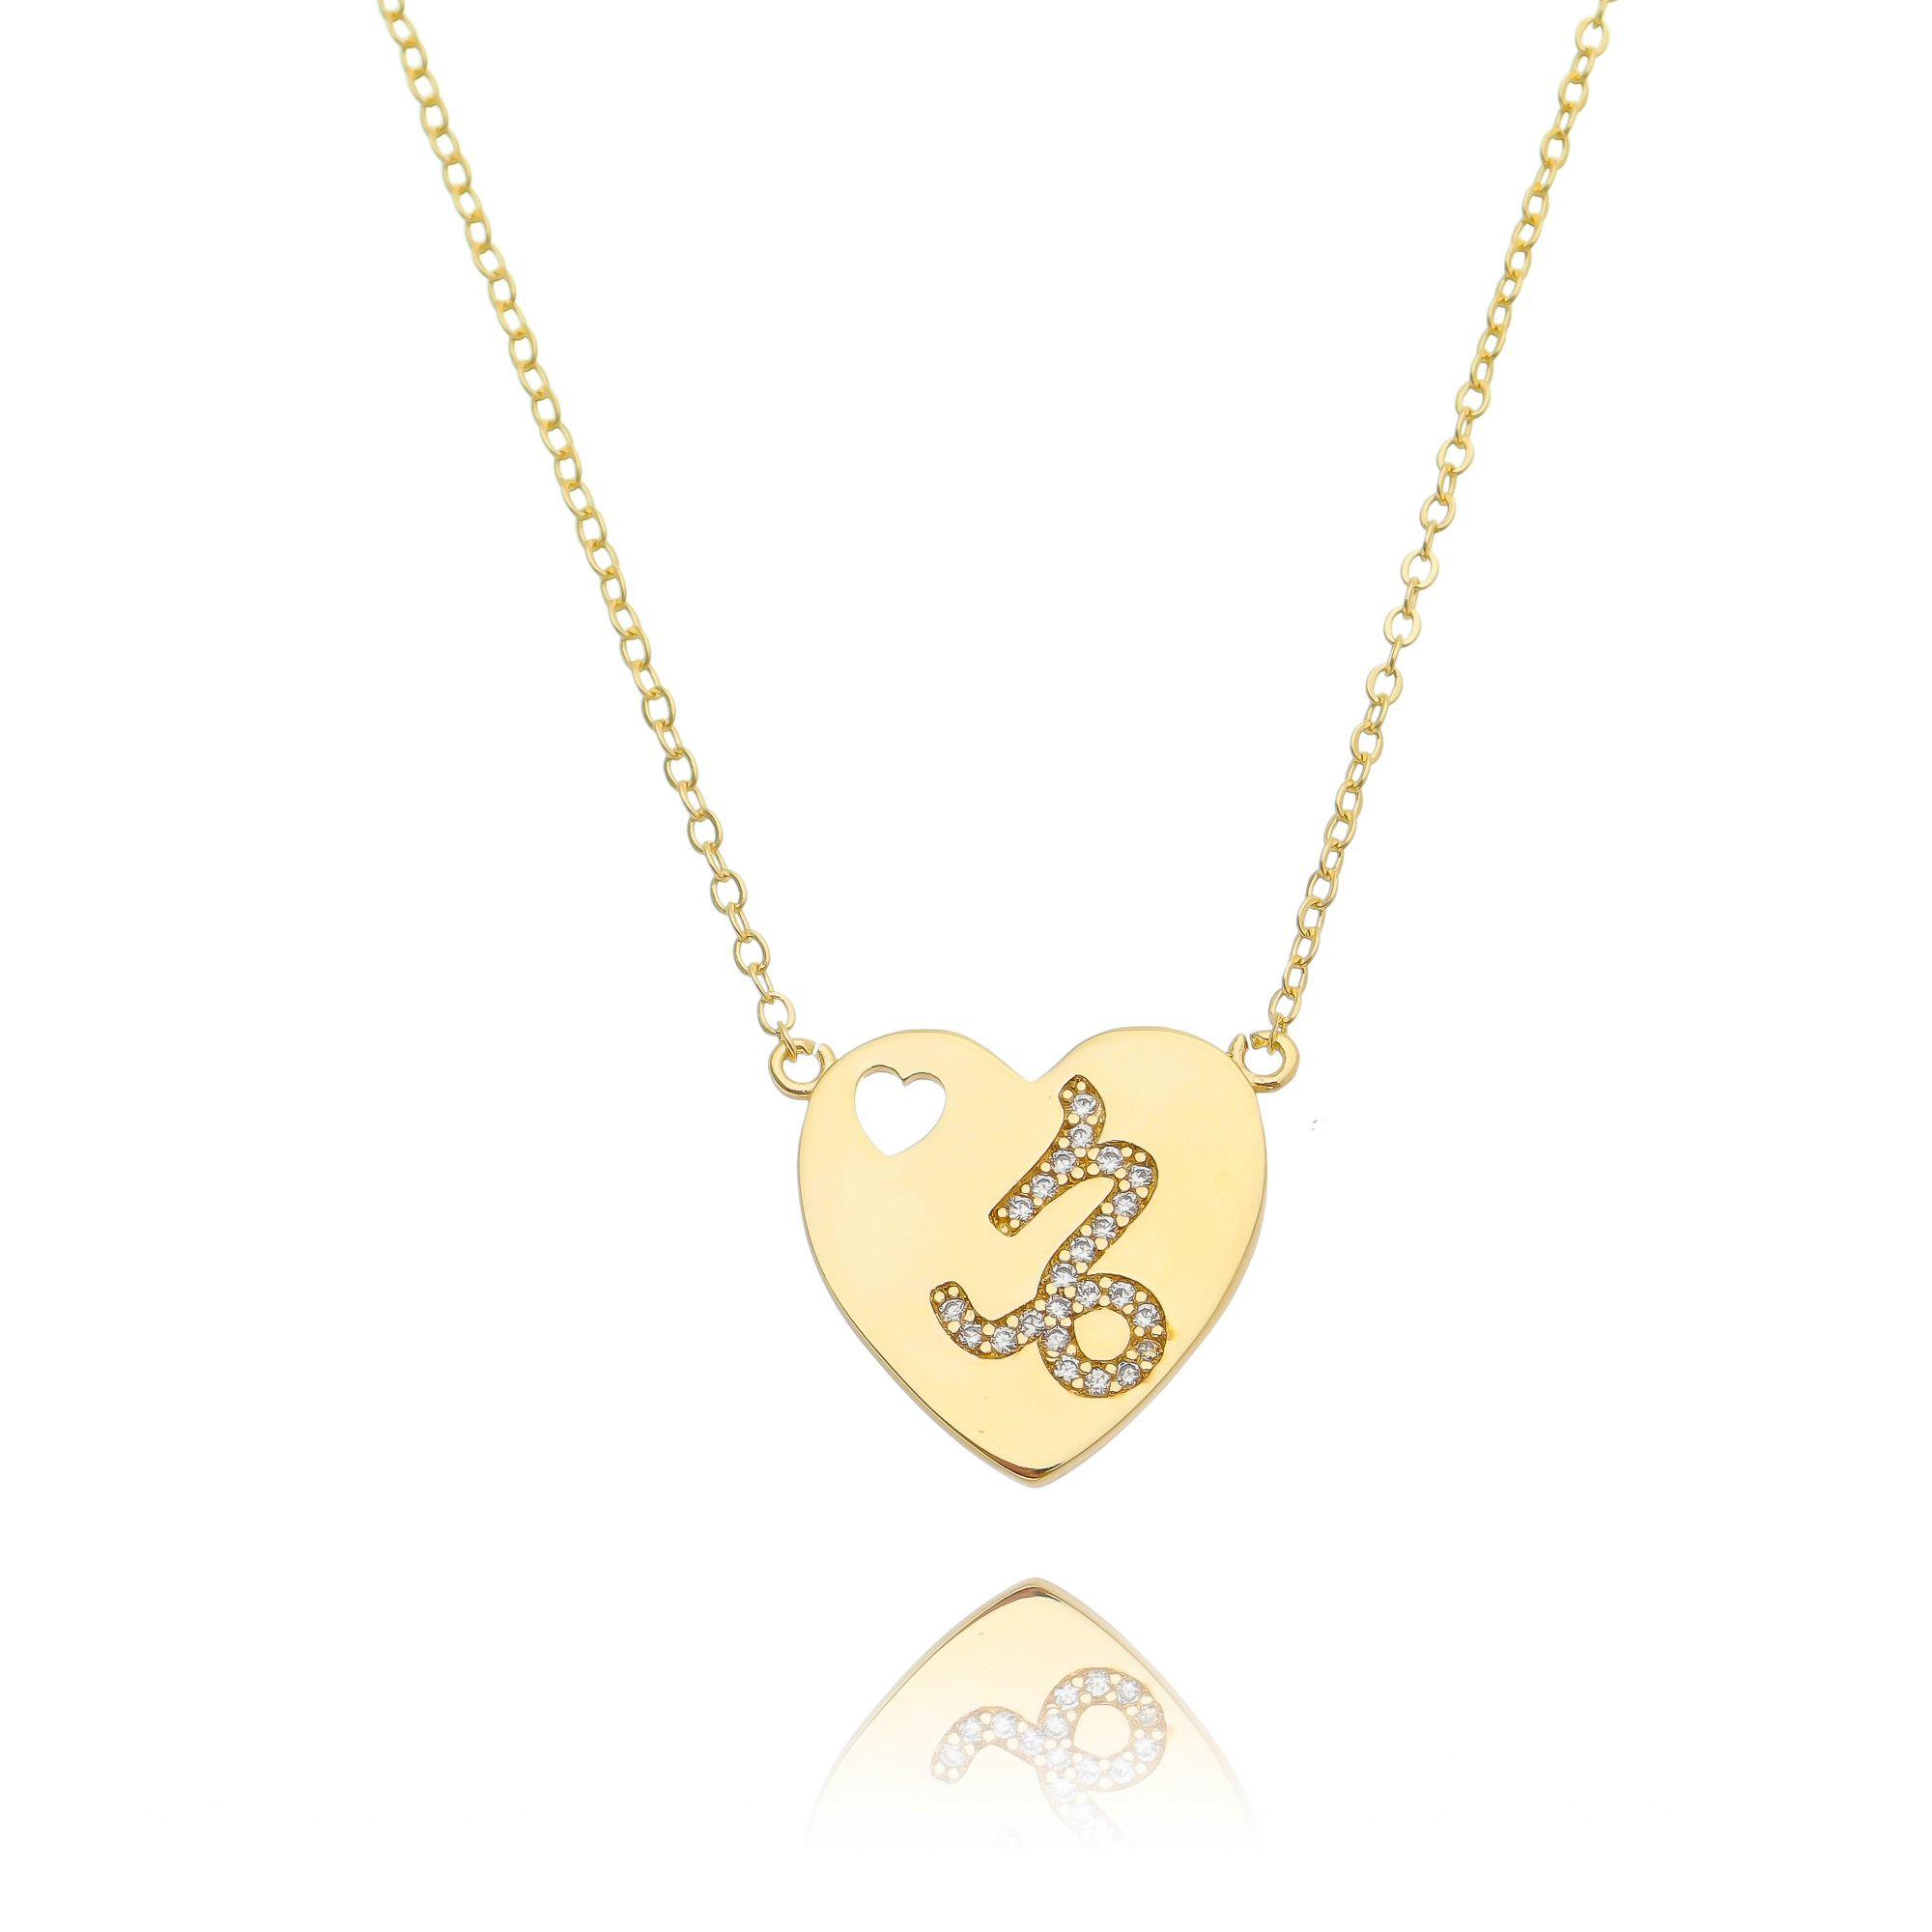 Colar Signo Capricórnio Dourado com Zircônia Branca Semijoia Luxo Ouro  - Soloyou